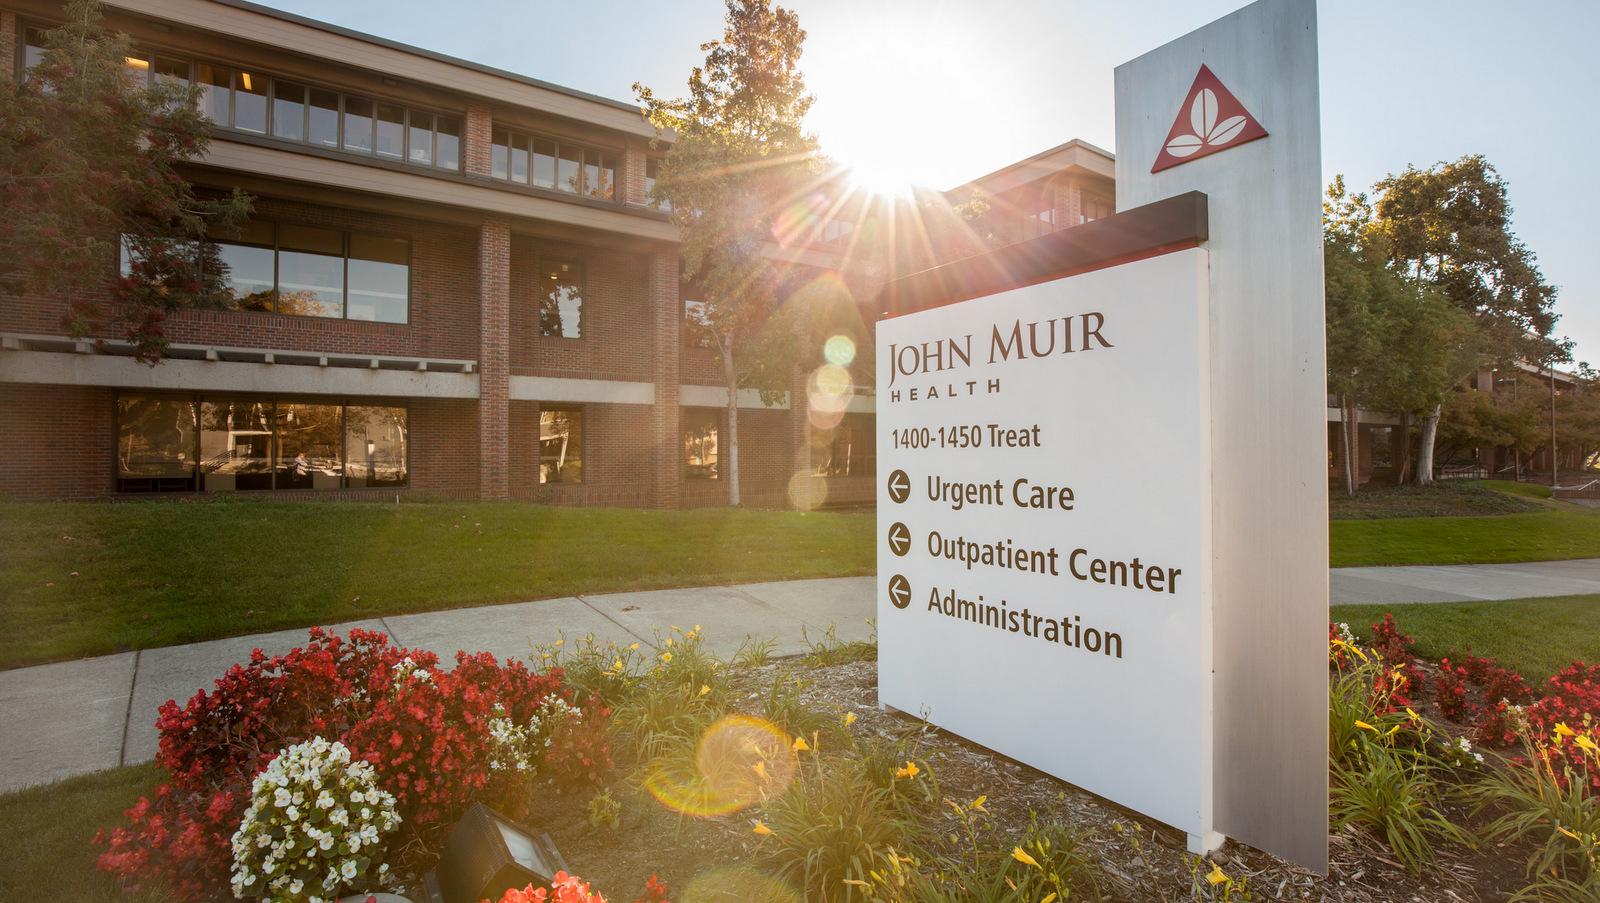 John Muir Health Urgent Care Center image 2